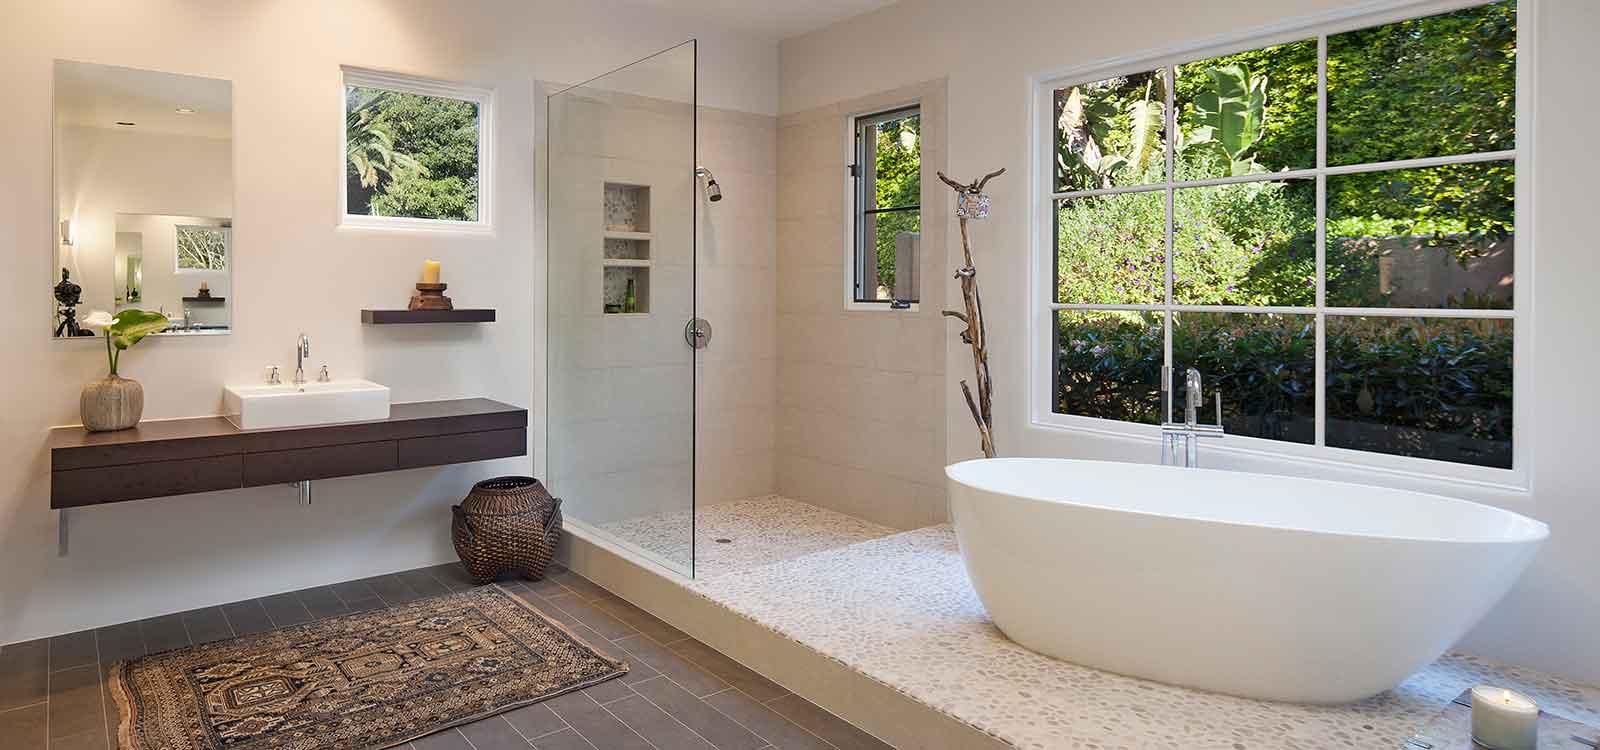 Renovating Your Bathroom Using Bathroom Renovations Professionals